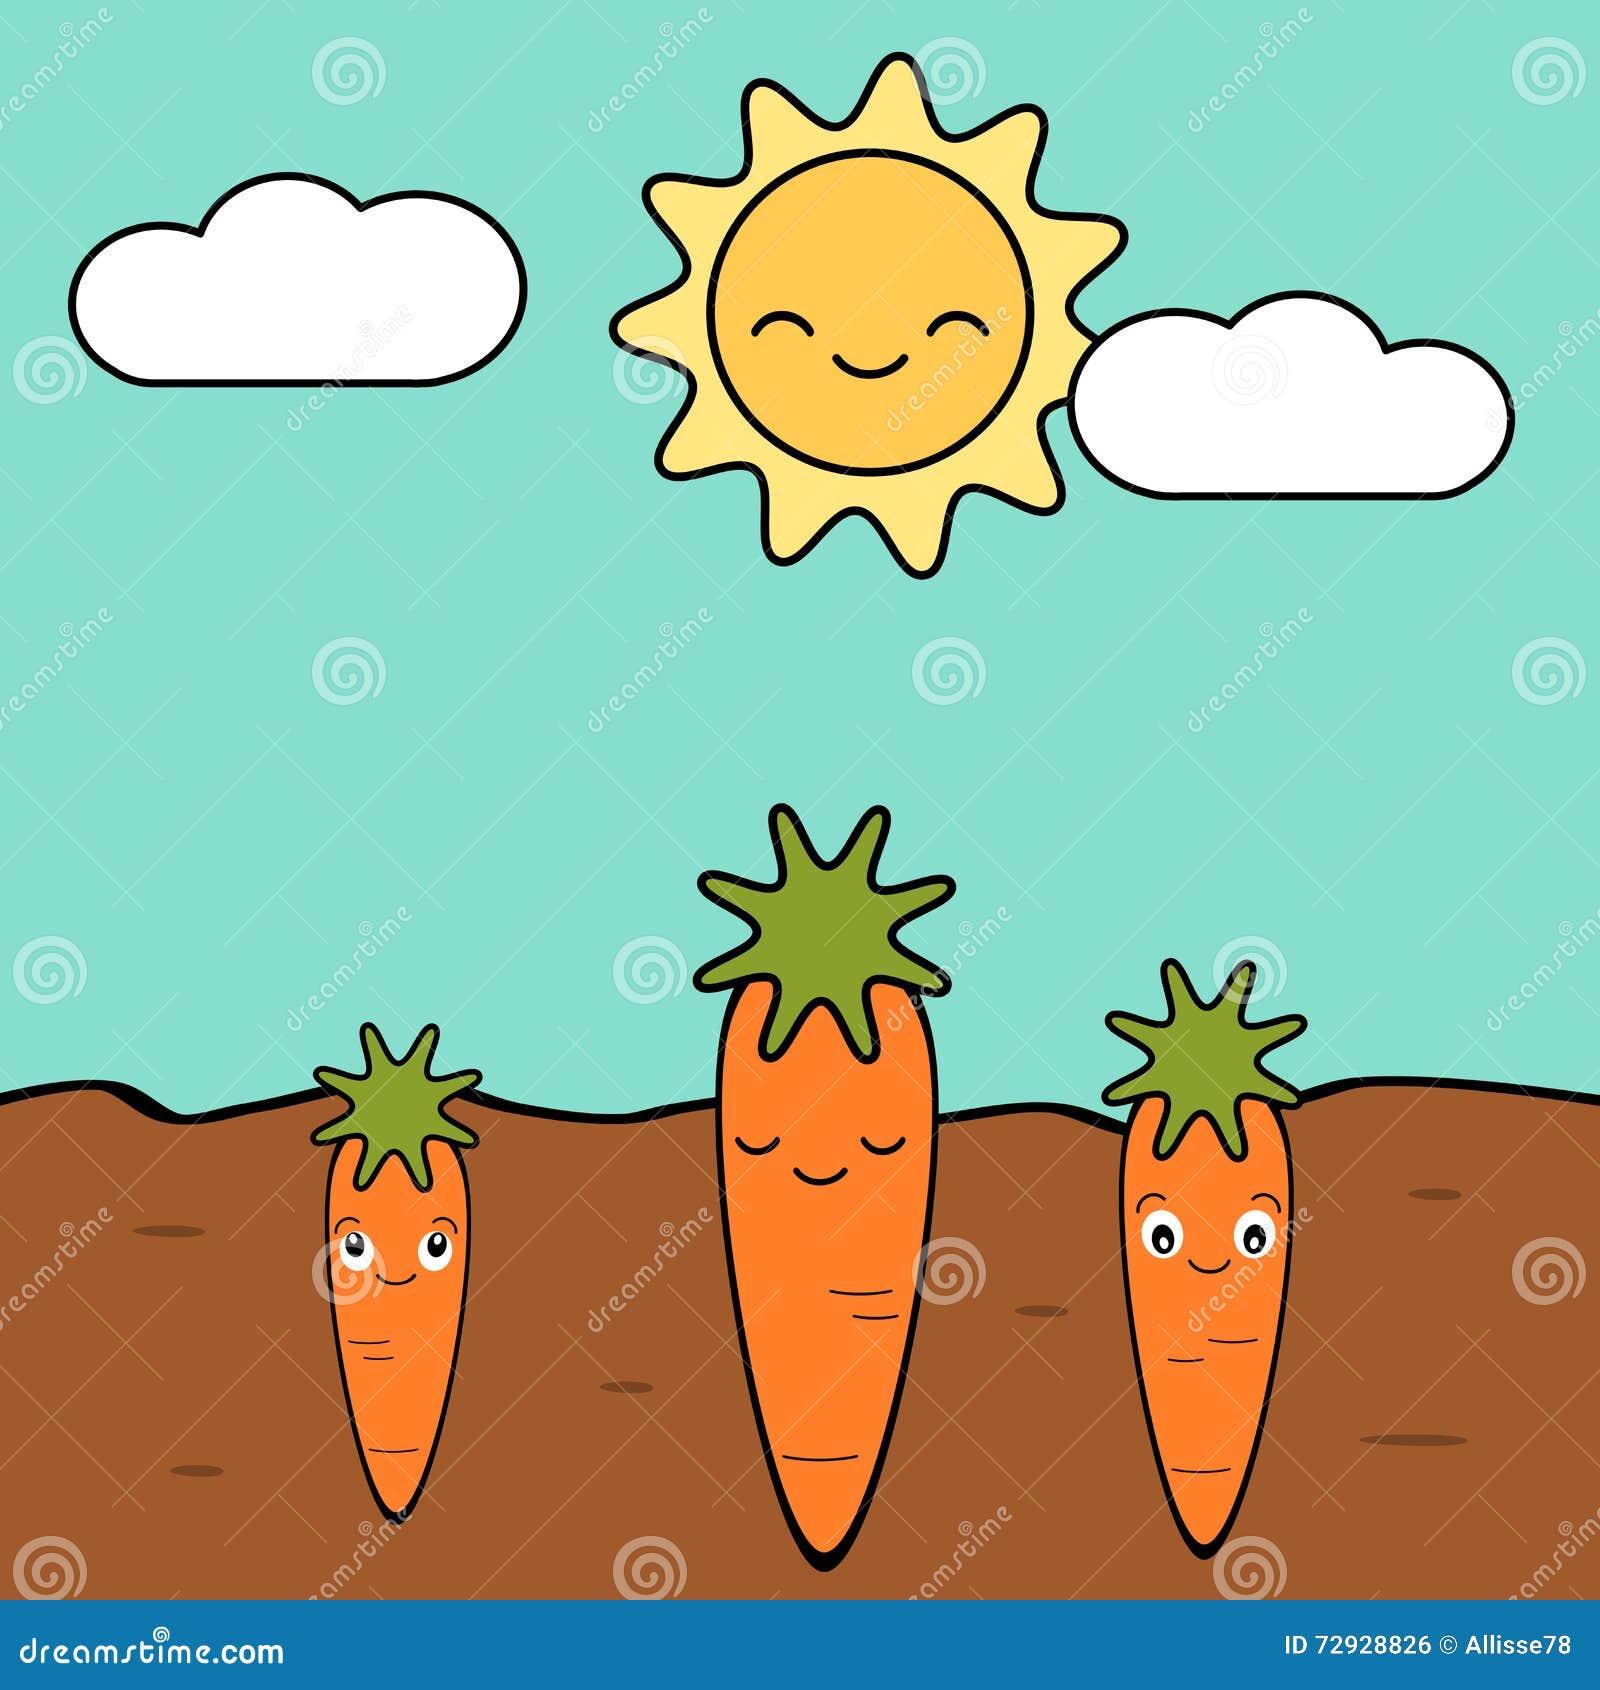 Garden Cute Cartoon: Cute Cartoon Carrots In The Garden Illustration Stock